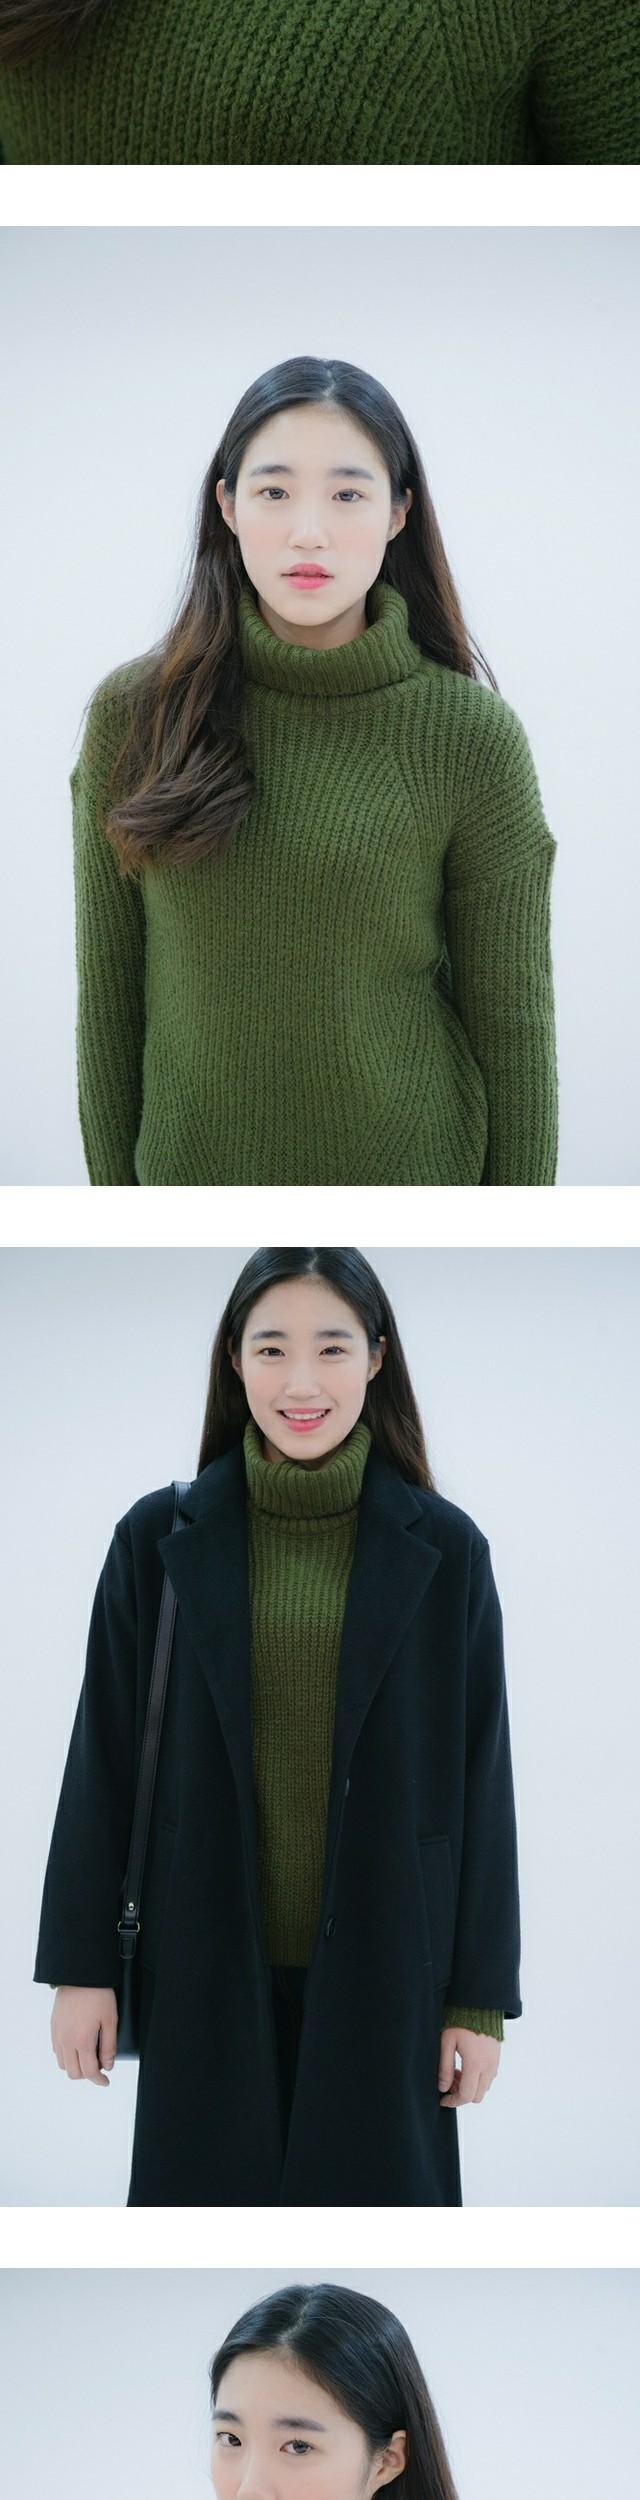 Mochi soft knit